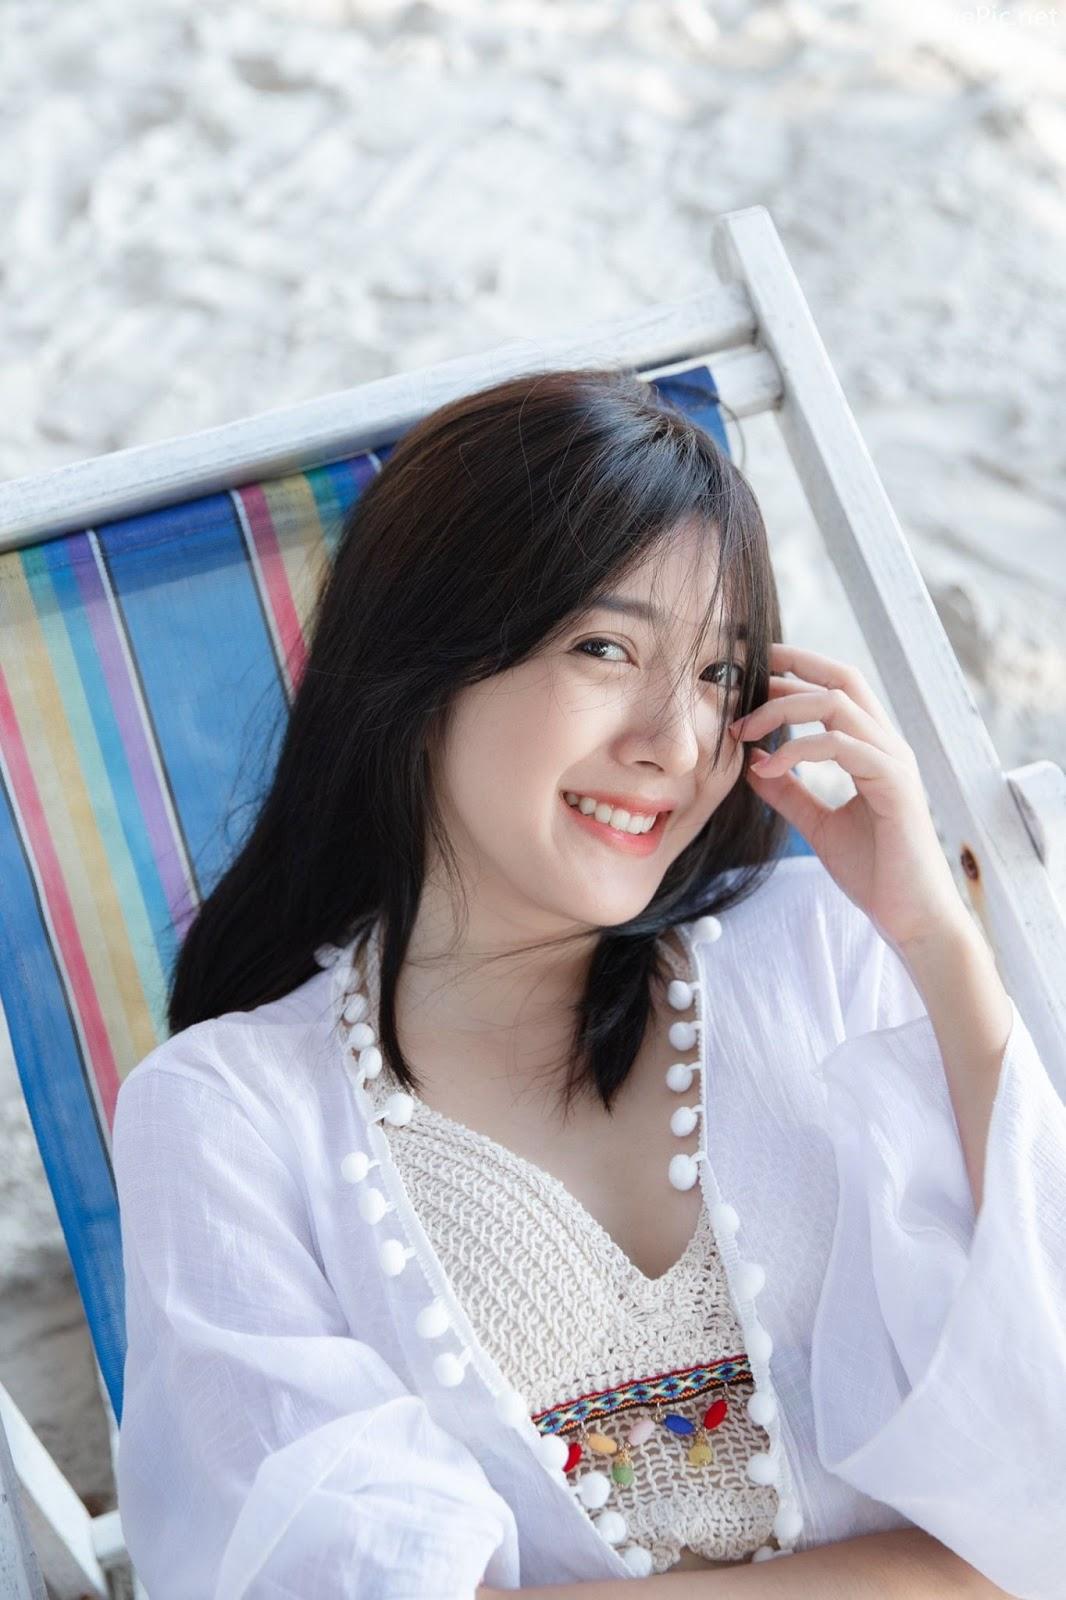 Thailand hot girl Purewarin Kosiriwalanon - Pure beauty and lovely with wool bikini - Picture 2